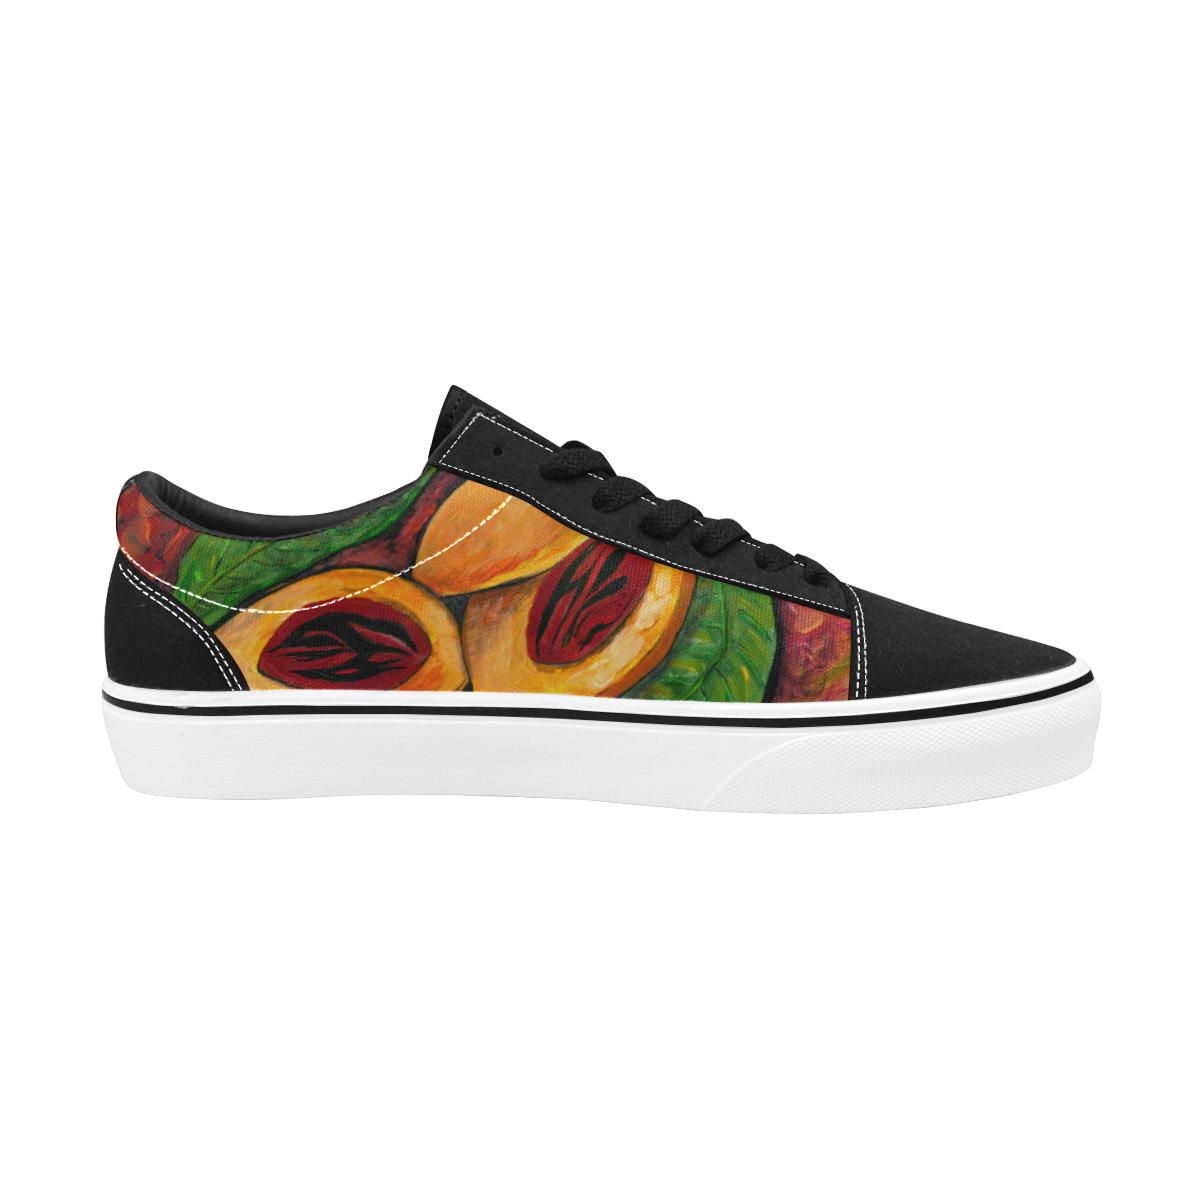 MANUSARTGND Women's Low Top Skateboarding Shoes (Model E001-2)